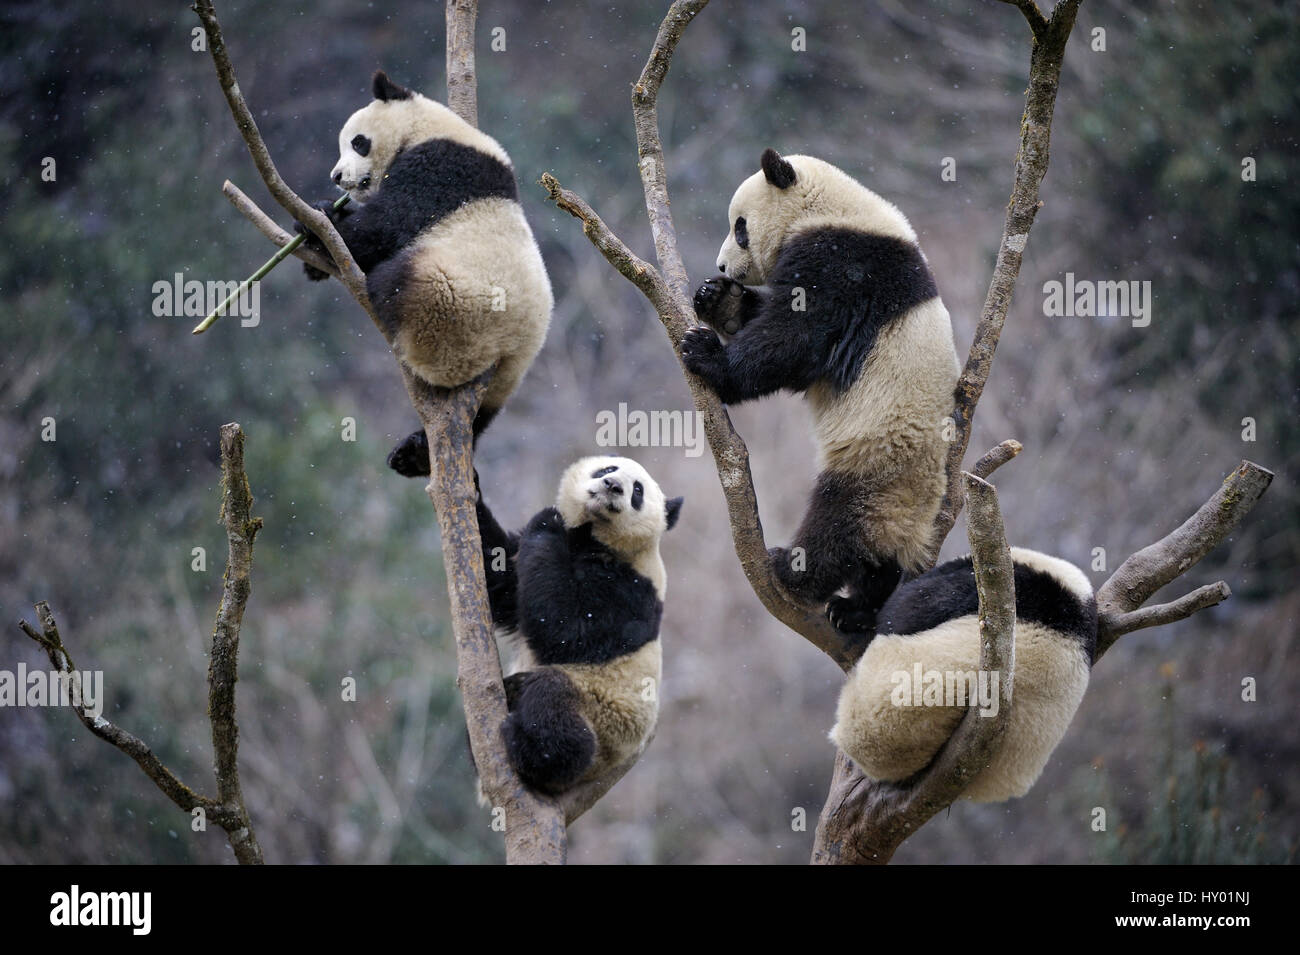 Four subadult Giant pandas (Ailuropoda melanoleuca) climbing in tree. Wolong Nature Reserve, Wenchuan, Sichuan Province, - Stock Image